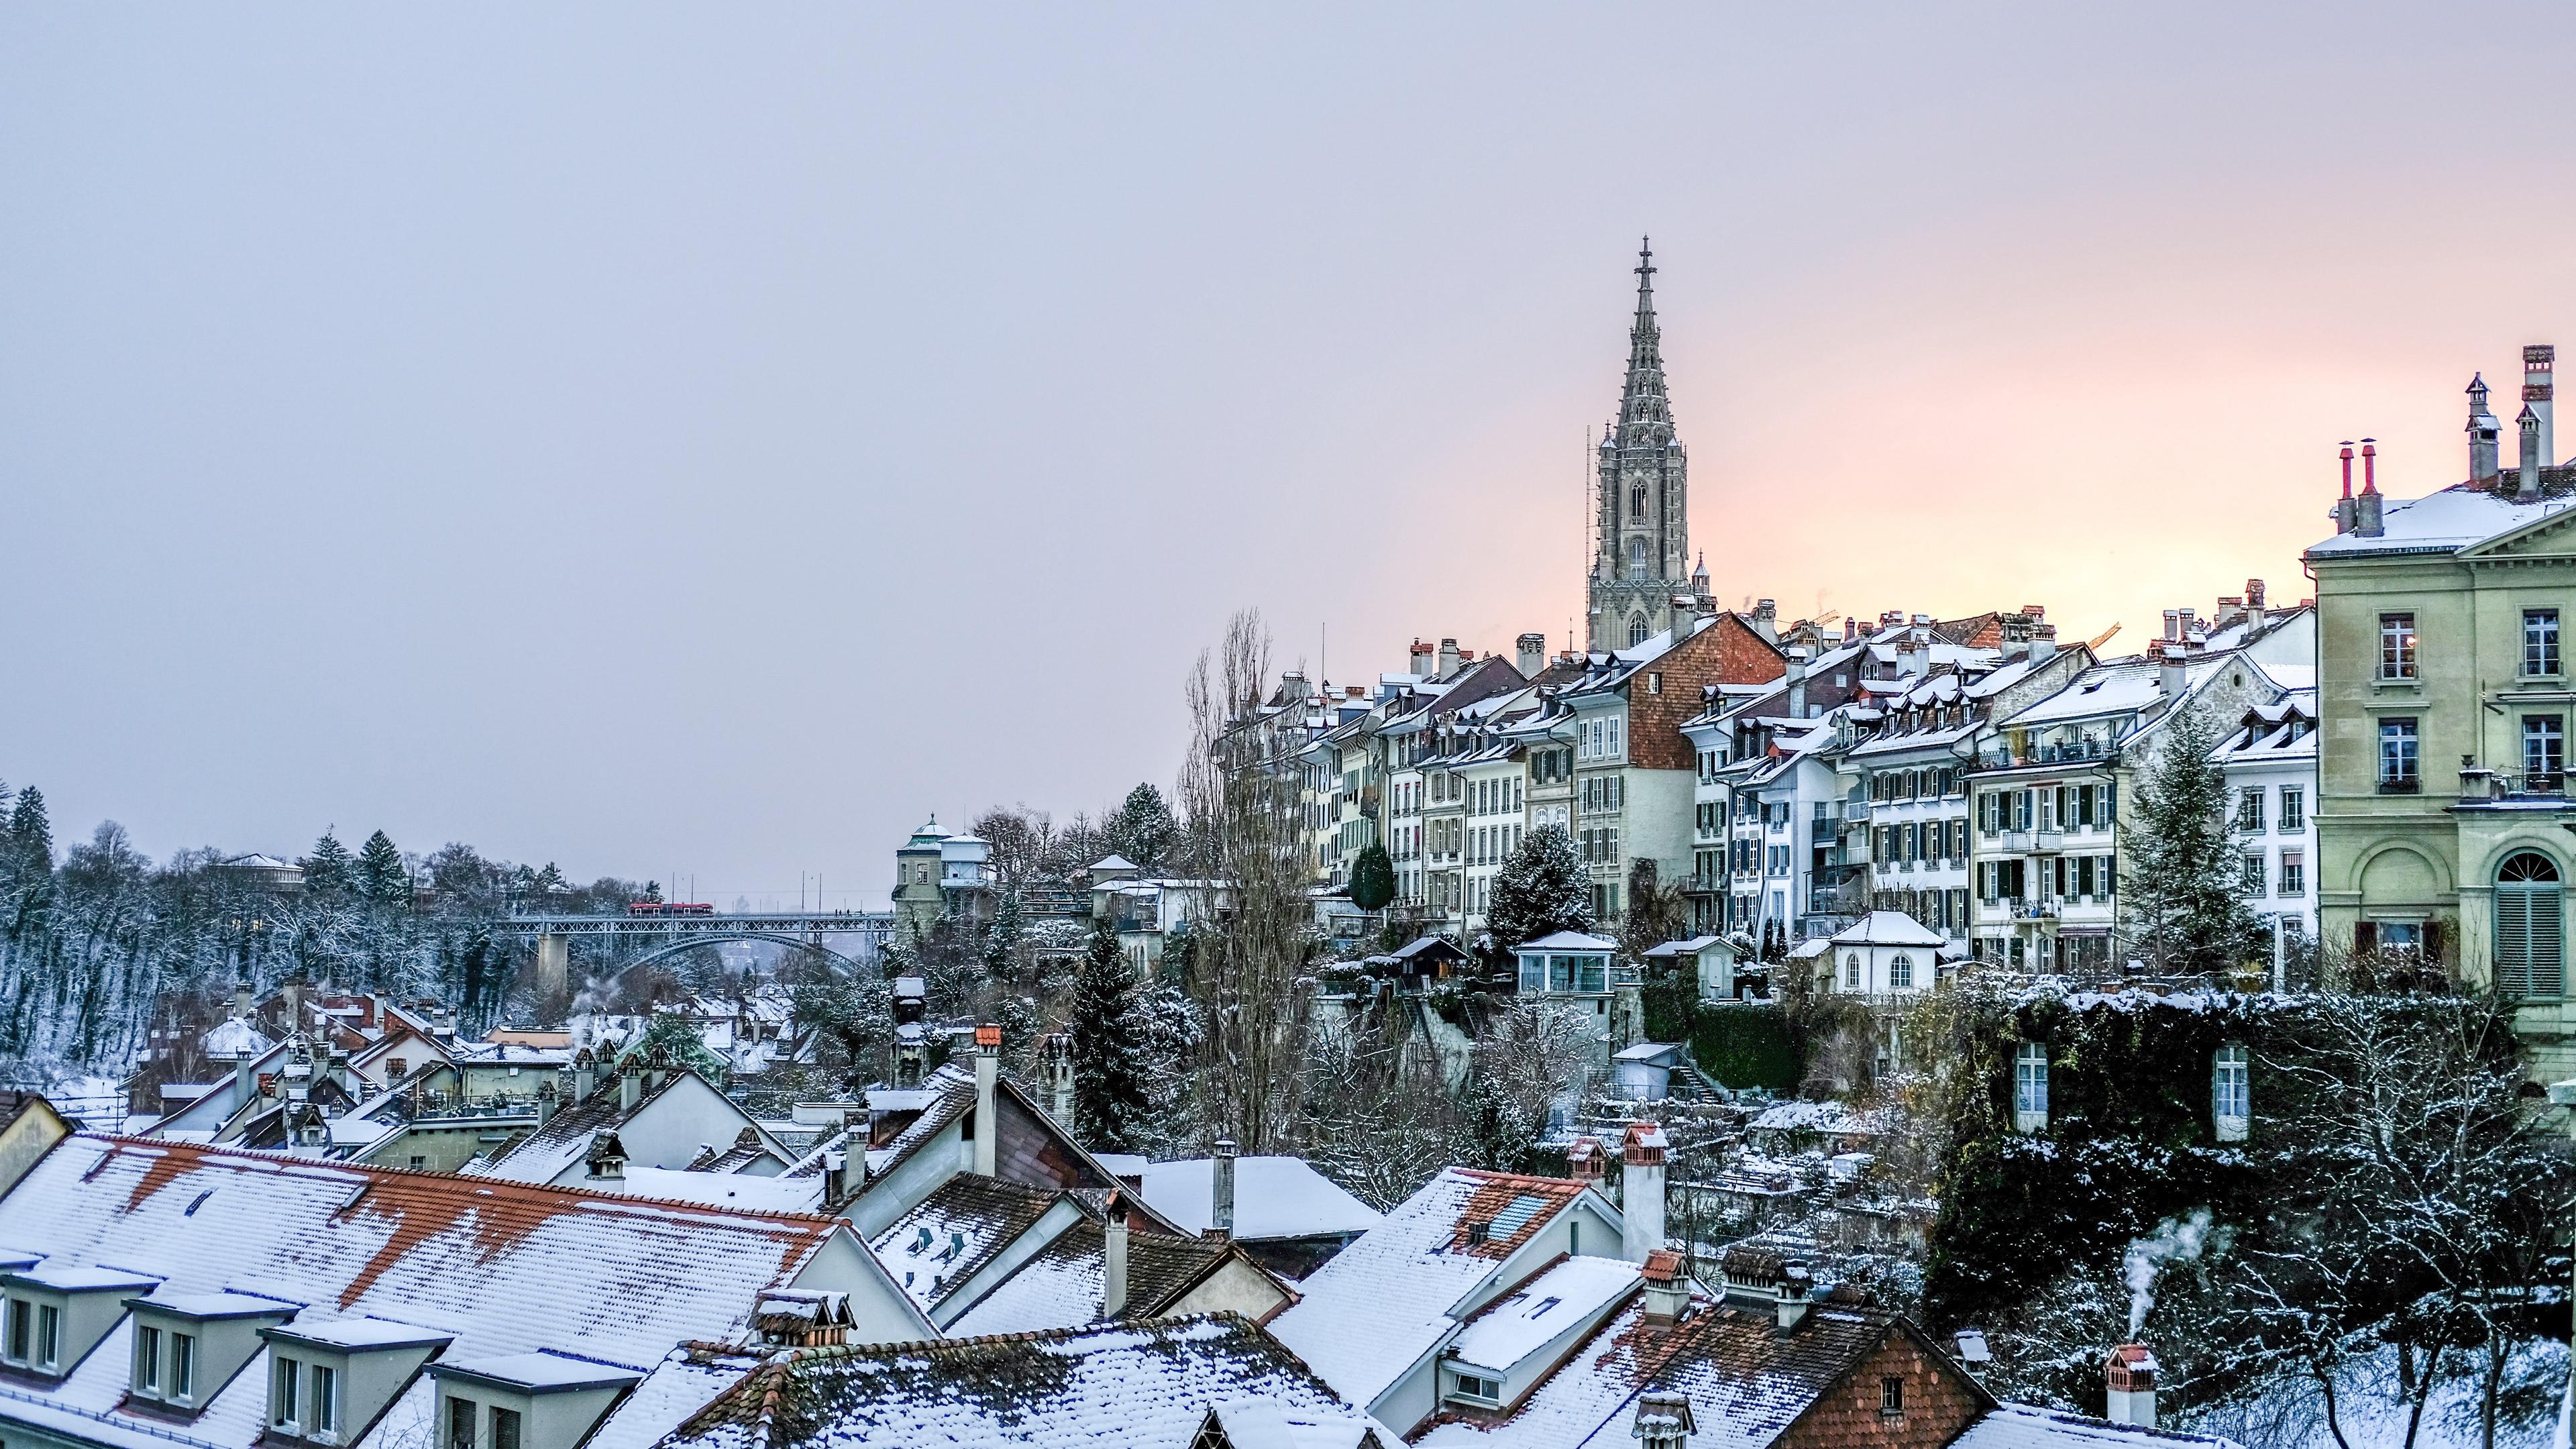 buildings roofs winter snow 4k 1538068699 - buildings, roofs, winter, snow 4k - Winter, roofs, buildings